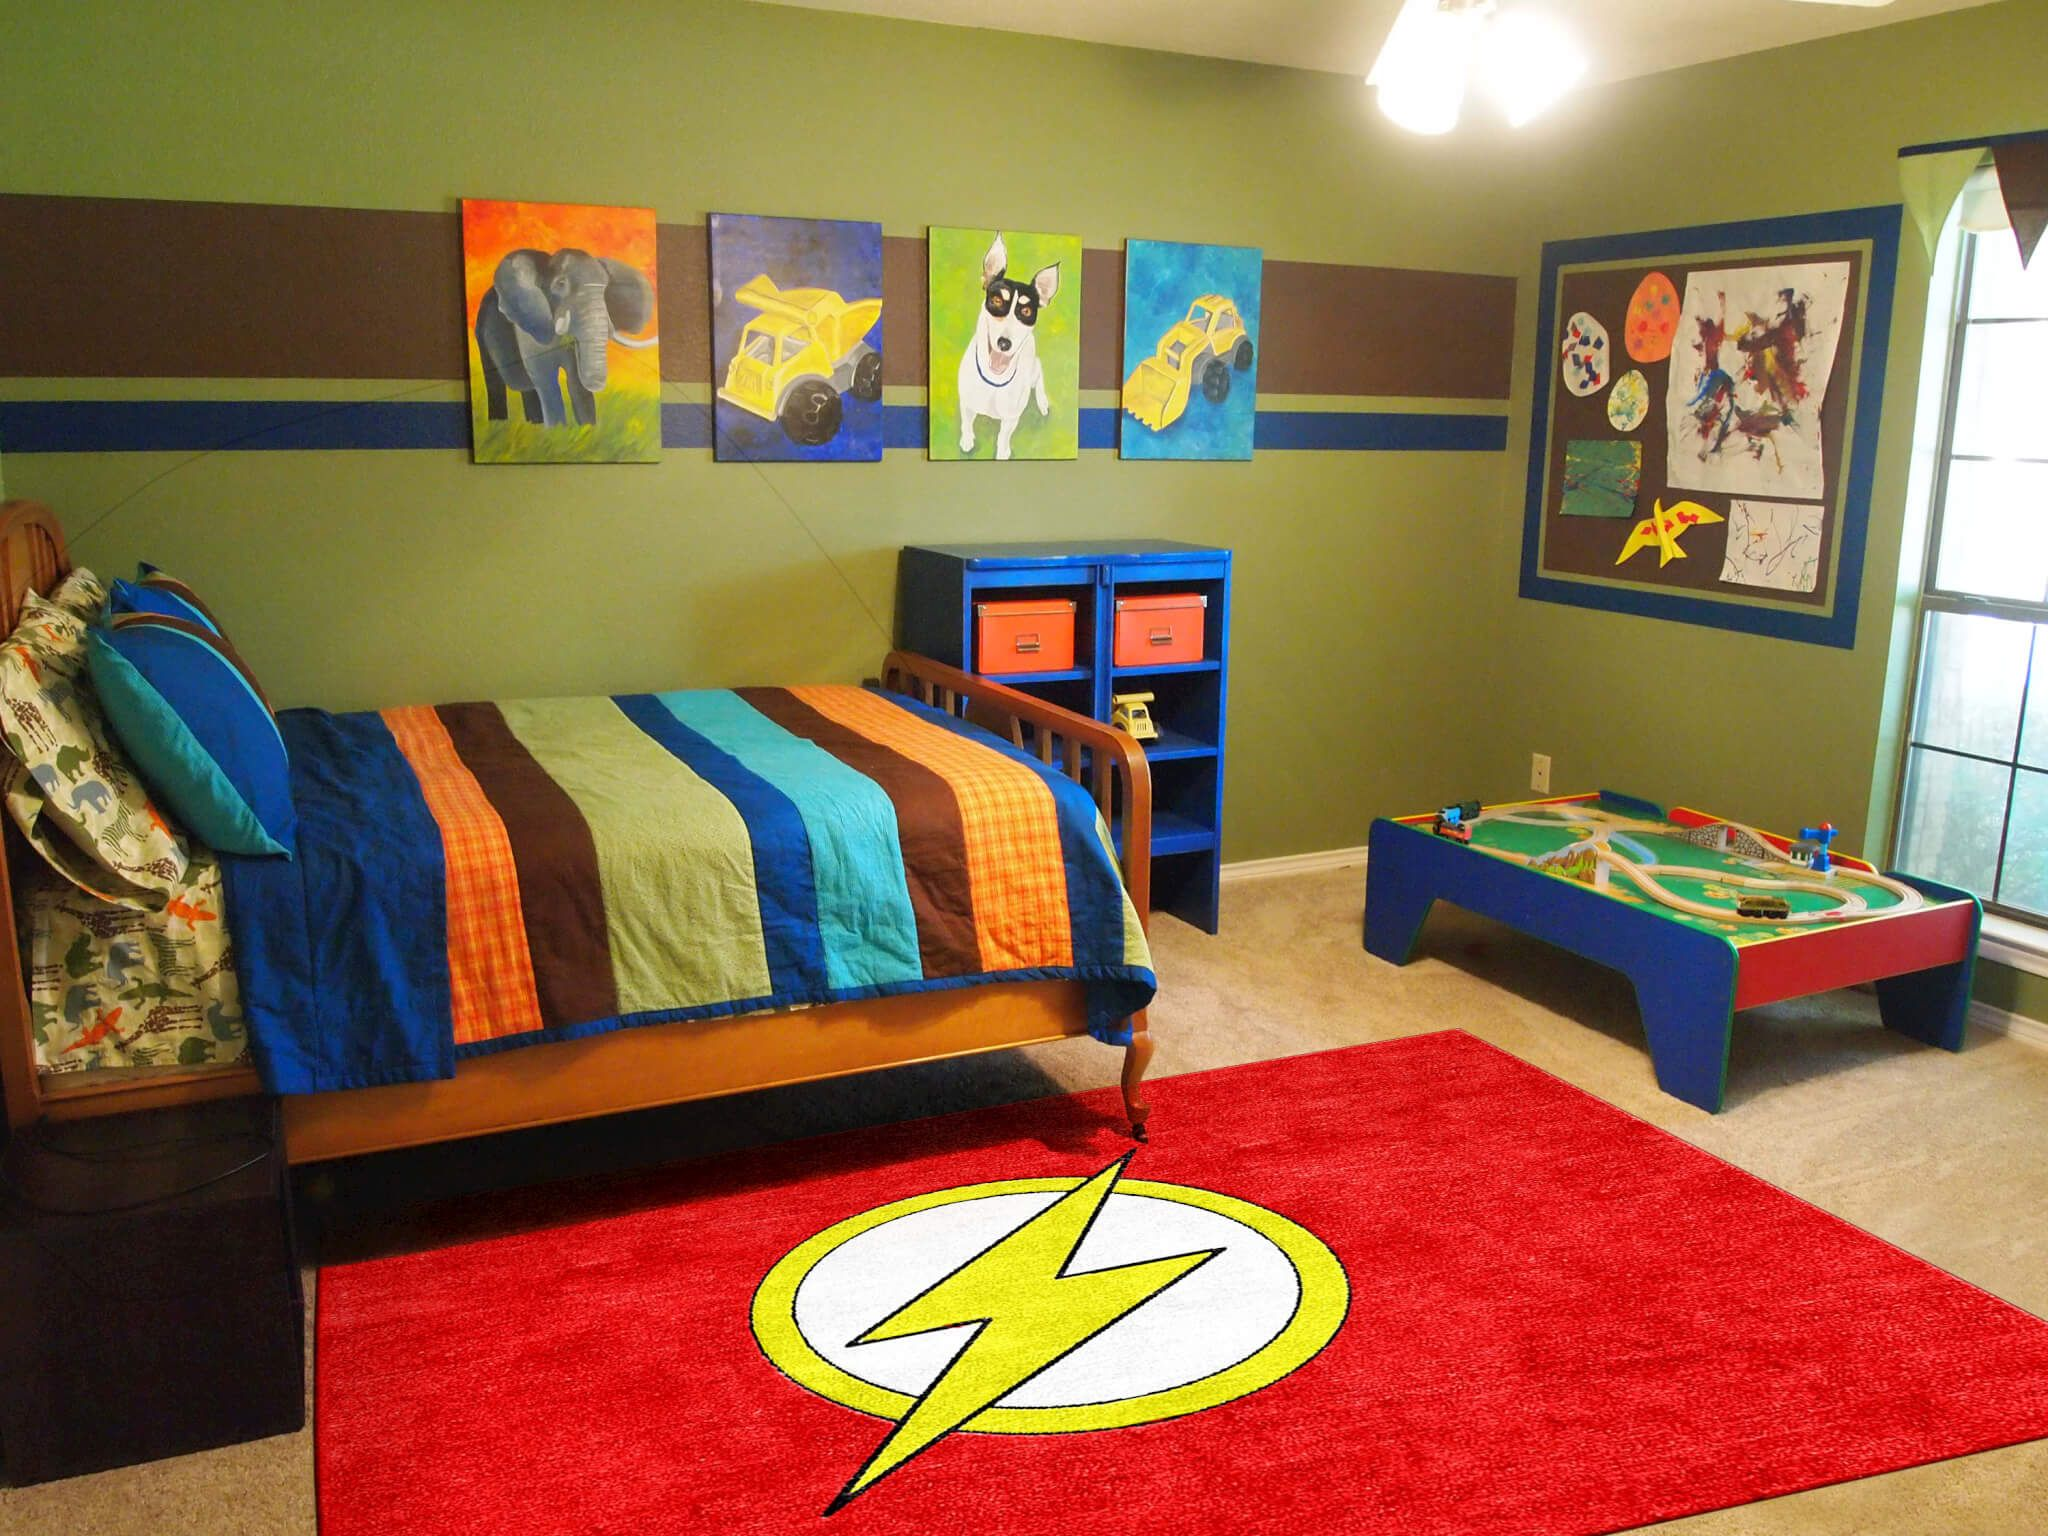 Childrens Rugs In 2019 Flash Room Bedroom Bedroom Decor Room